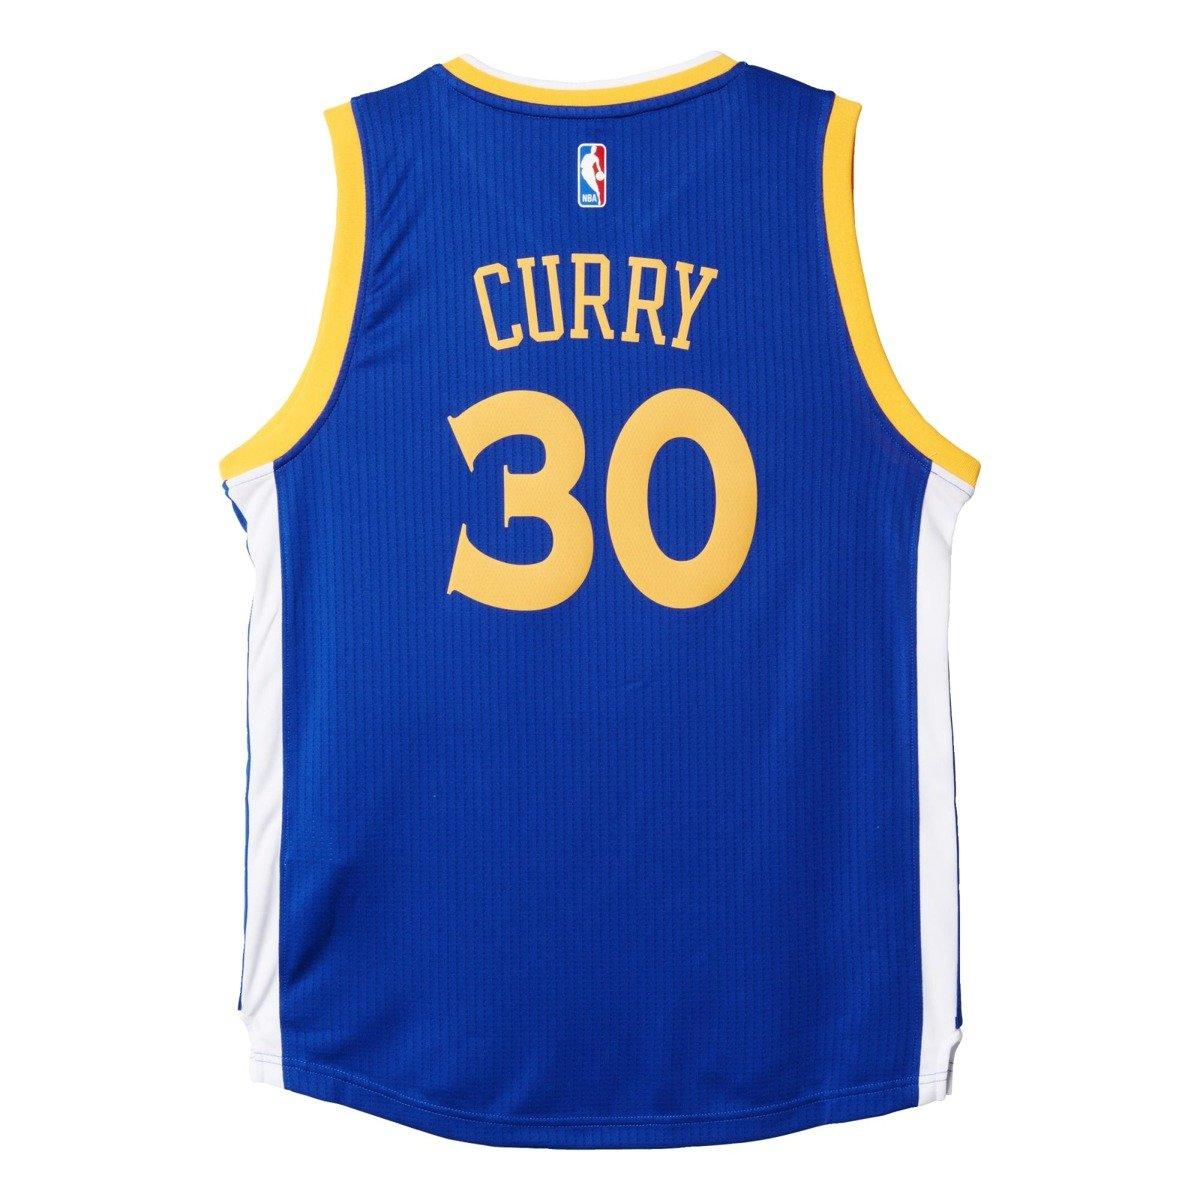 b4008eb51333 Adidas Stephen Curry  30 Golden State Warriors Jersey - A45910 ...